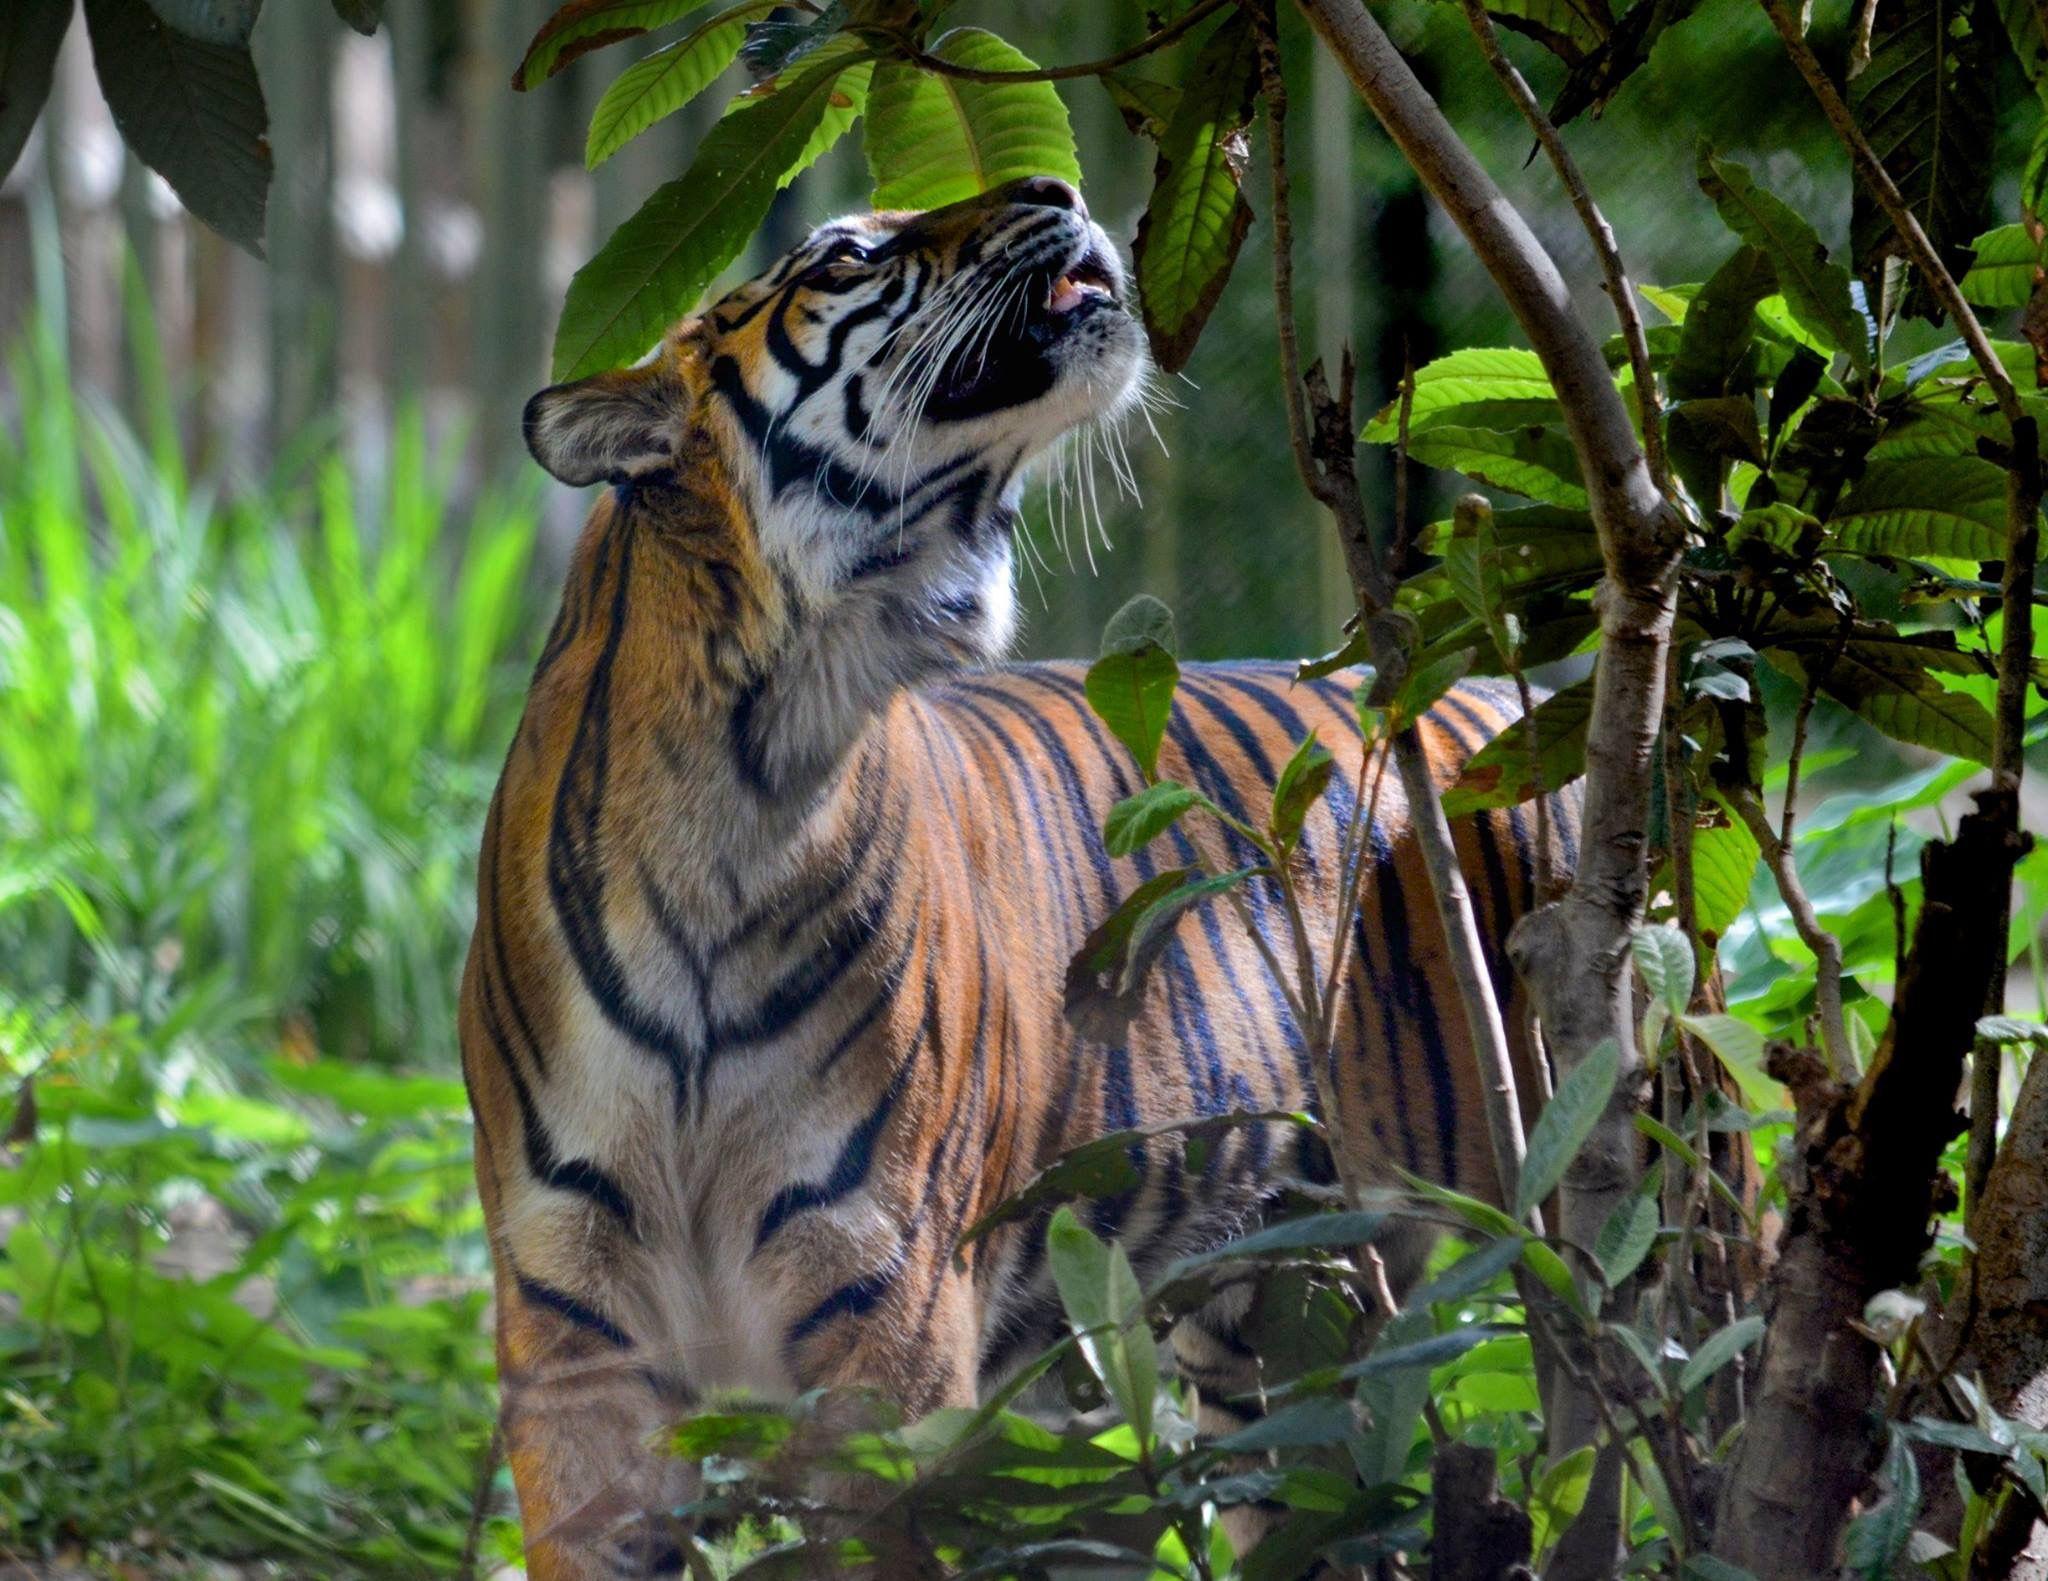 Pin by Shelley Benz on Wildlife Wildlife, Animals, Tiger